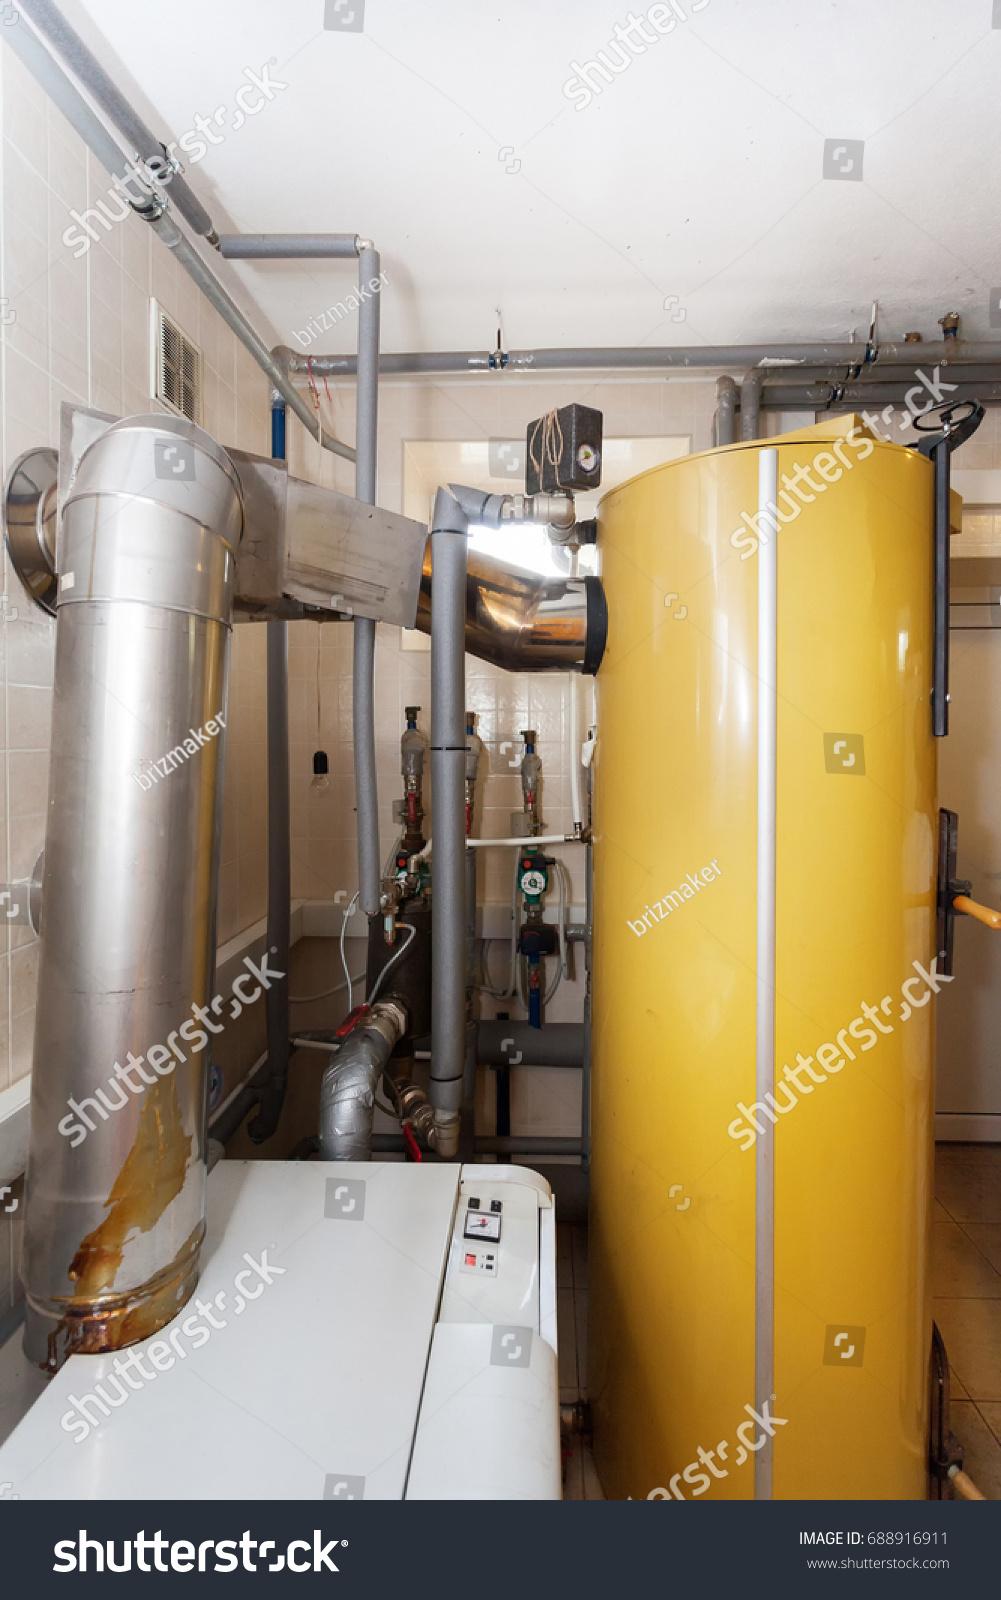 Domestic Household Boiler Room New Modern Stock Photo (Edit Now ...